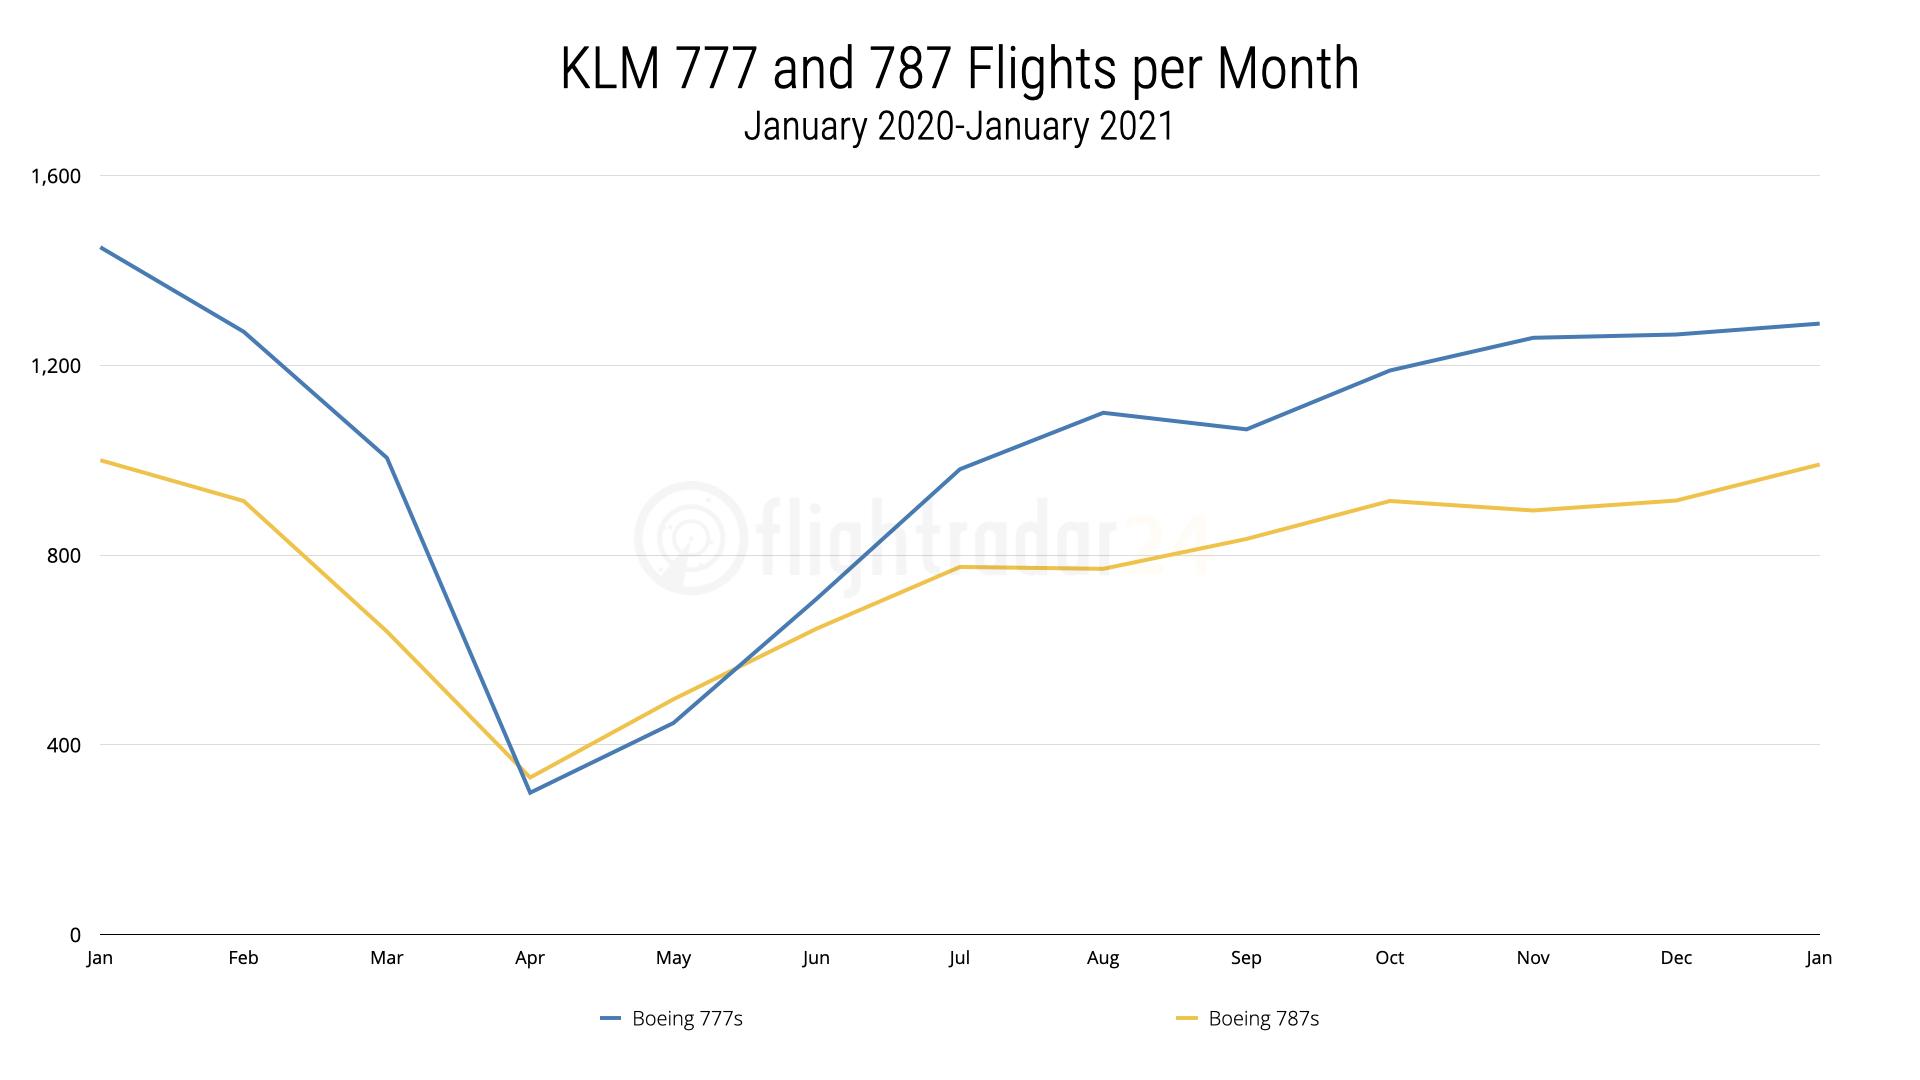 KLM 777 and 787 Flights January 2020 to January 2021